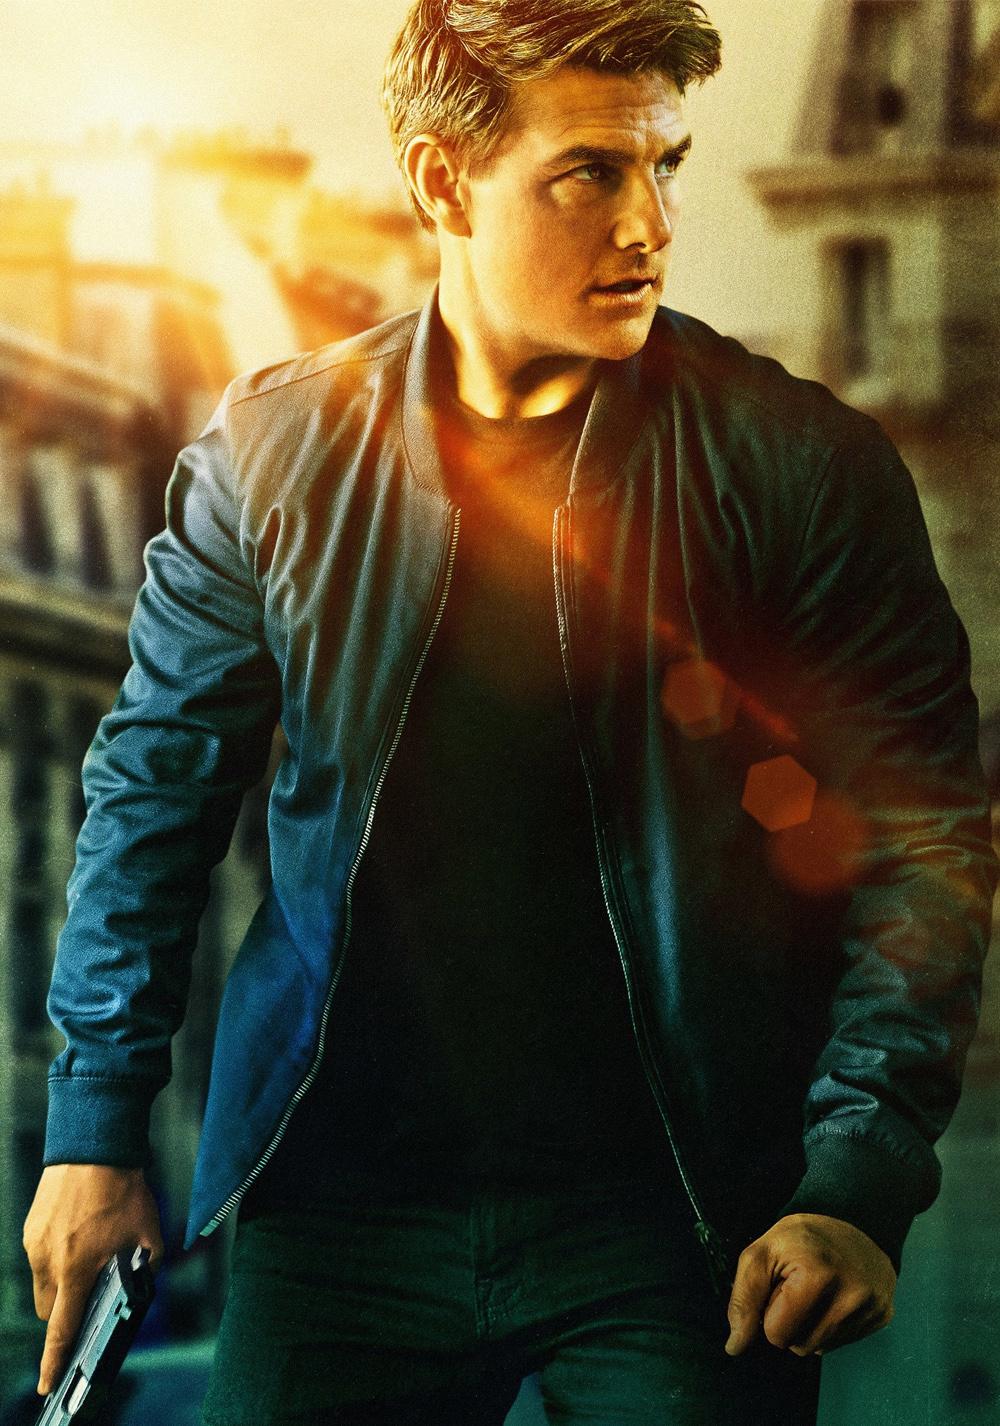 Ethan Hunt (Tom Cruise) en Mission: Impossible – Fallout (2018). Imagen: fanart.tv